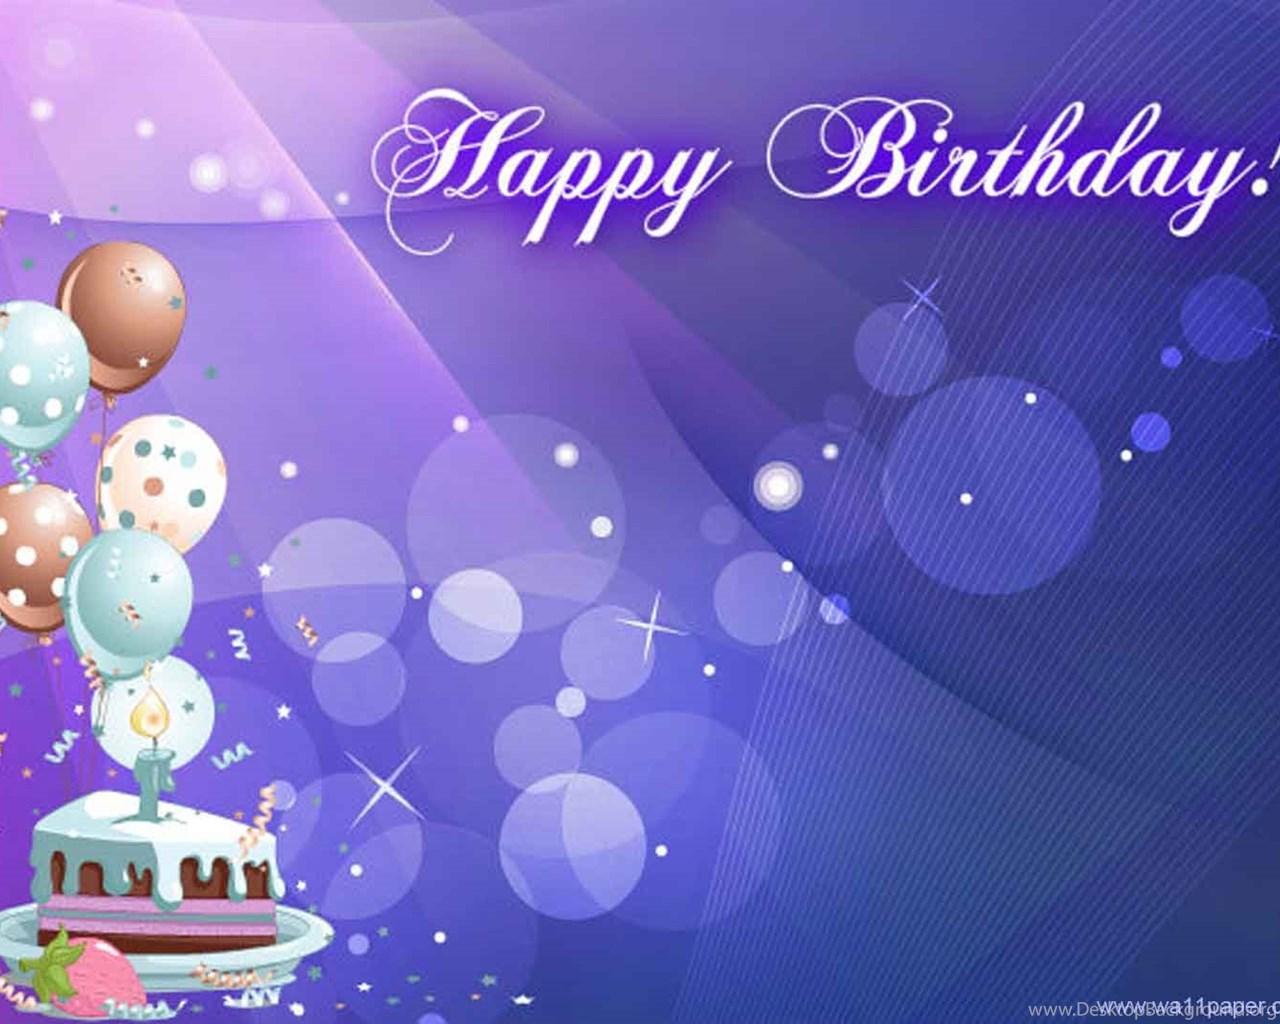 Happy Birthday Background Images For Men Celebrating